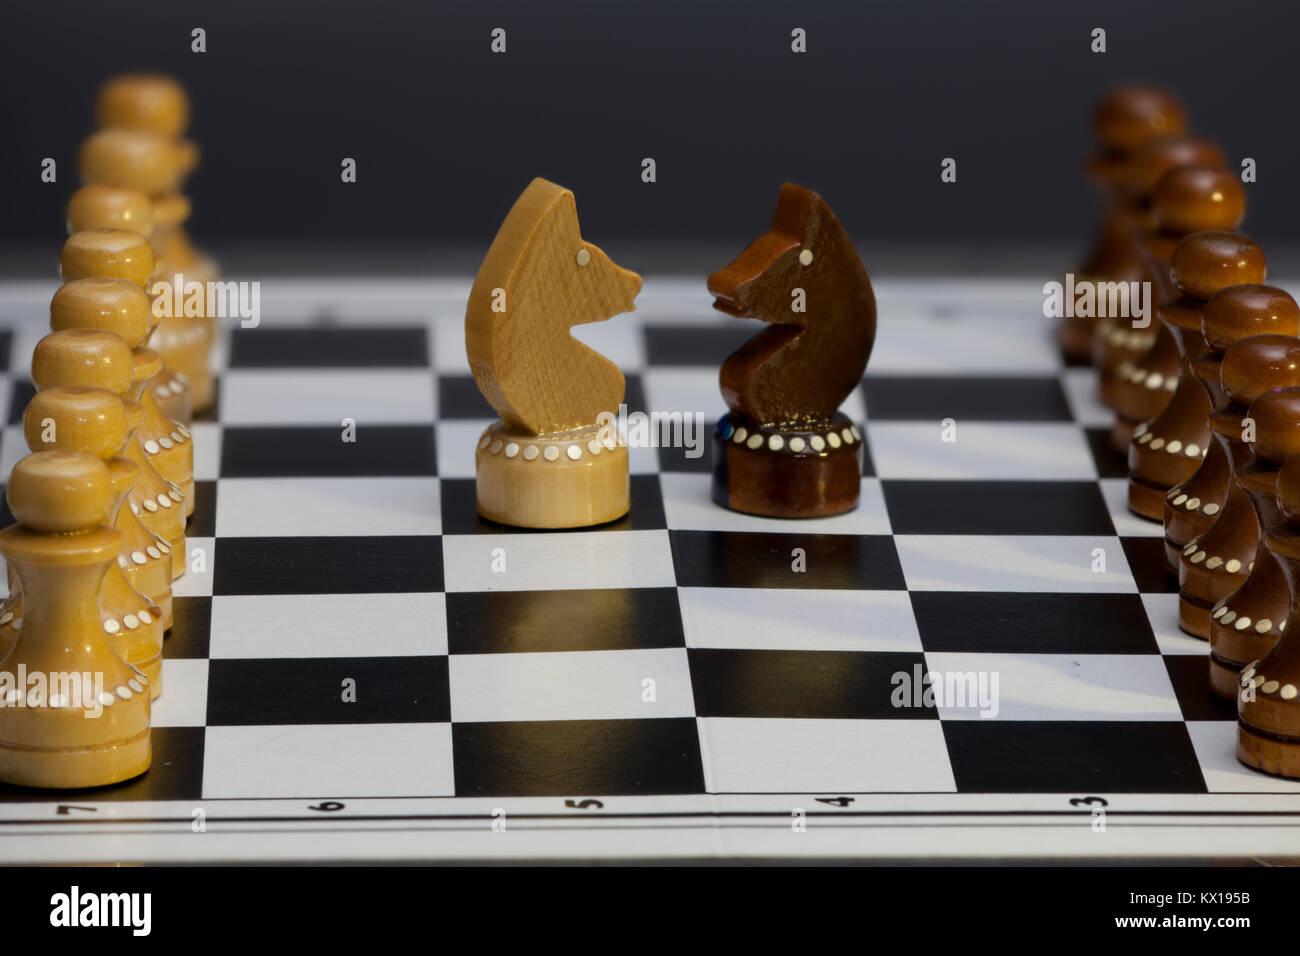 Schach Ritter Konfrontation Kopf an Kopf, Schach Figuren auf einem Schachbrett Stockbild